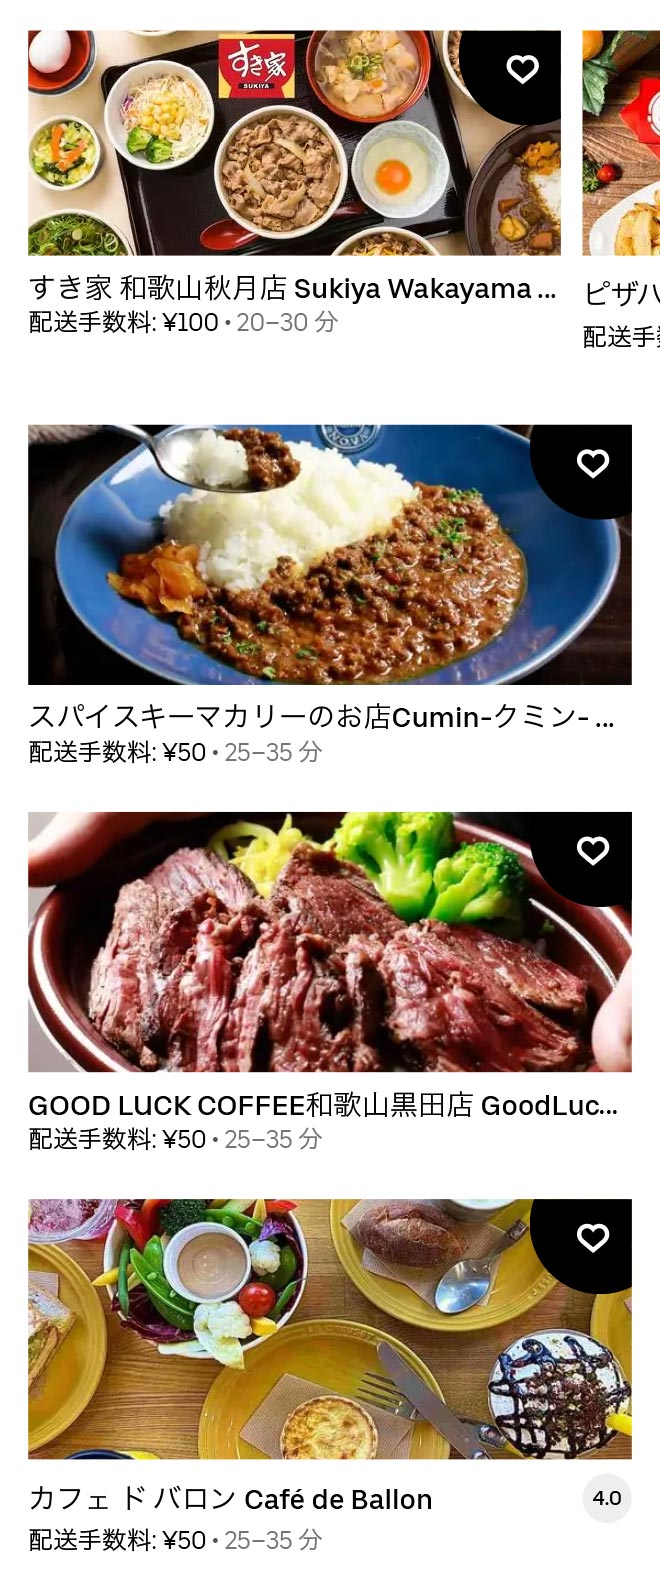 U wakayama menu 2104 08